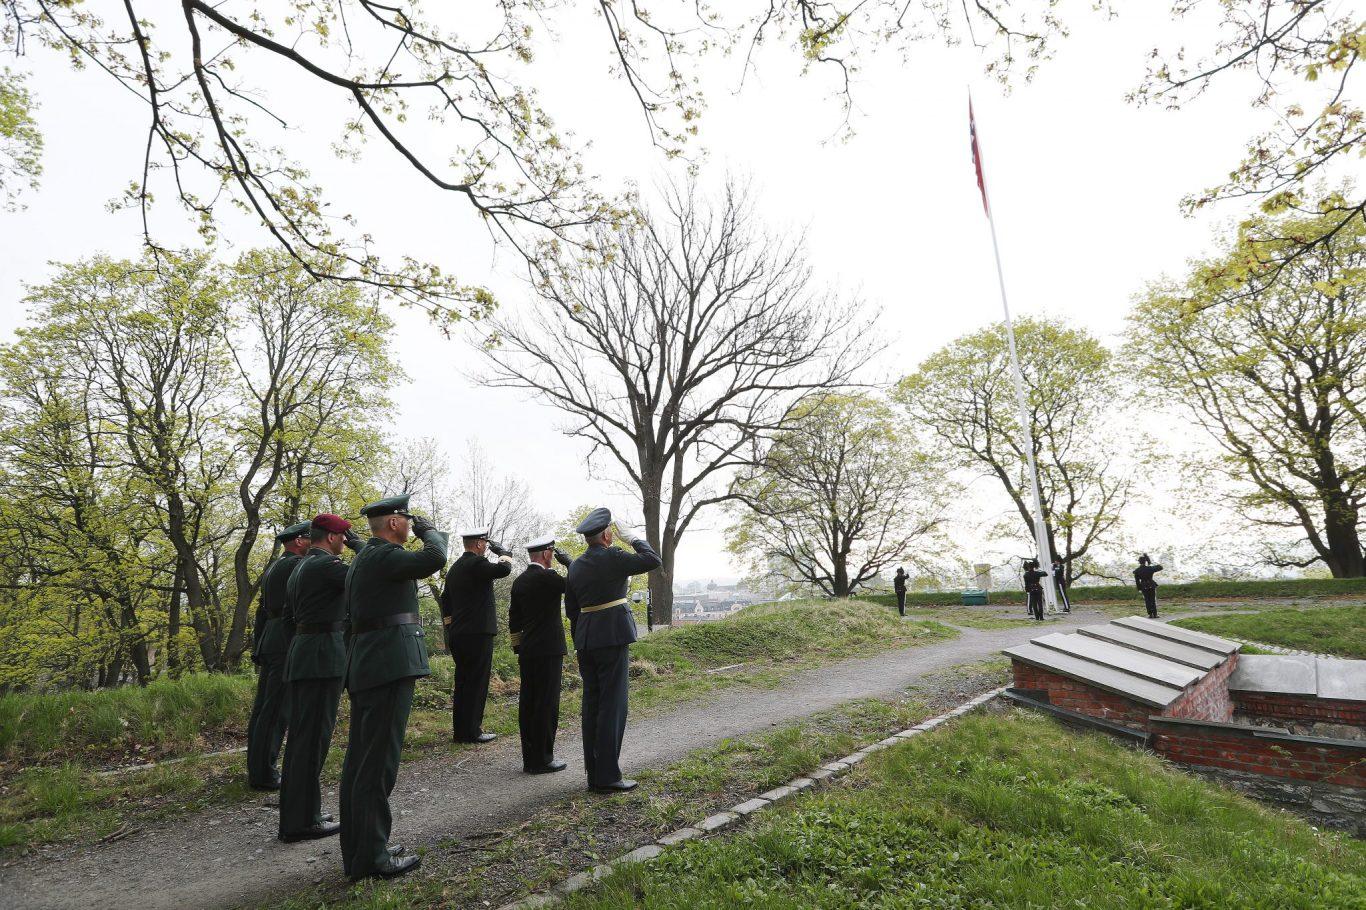 Flaggheising på Akershus Festning 8. mai 2018. Foto: Torbjørn Kjosvold / Forsvaret